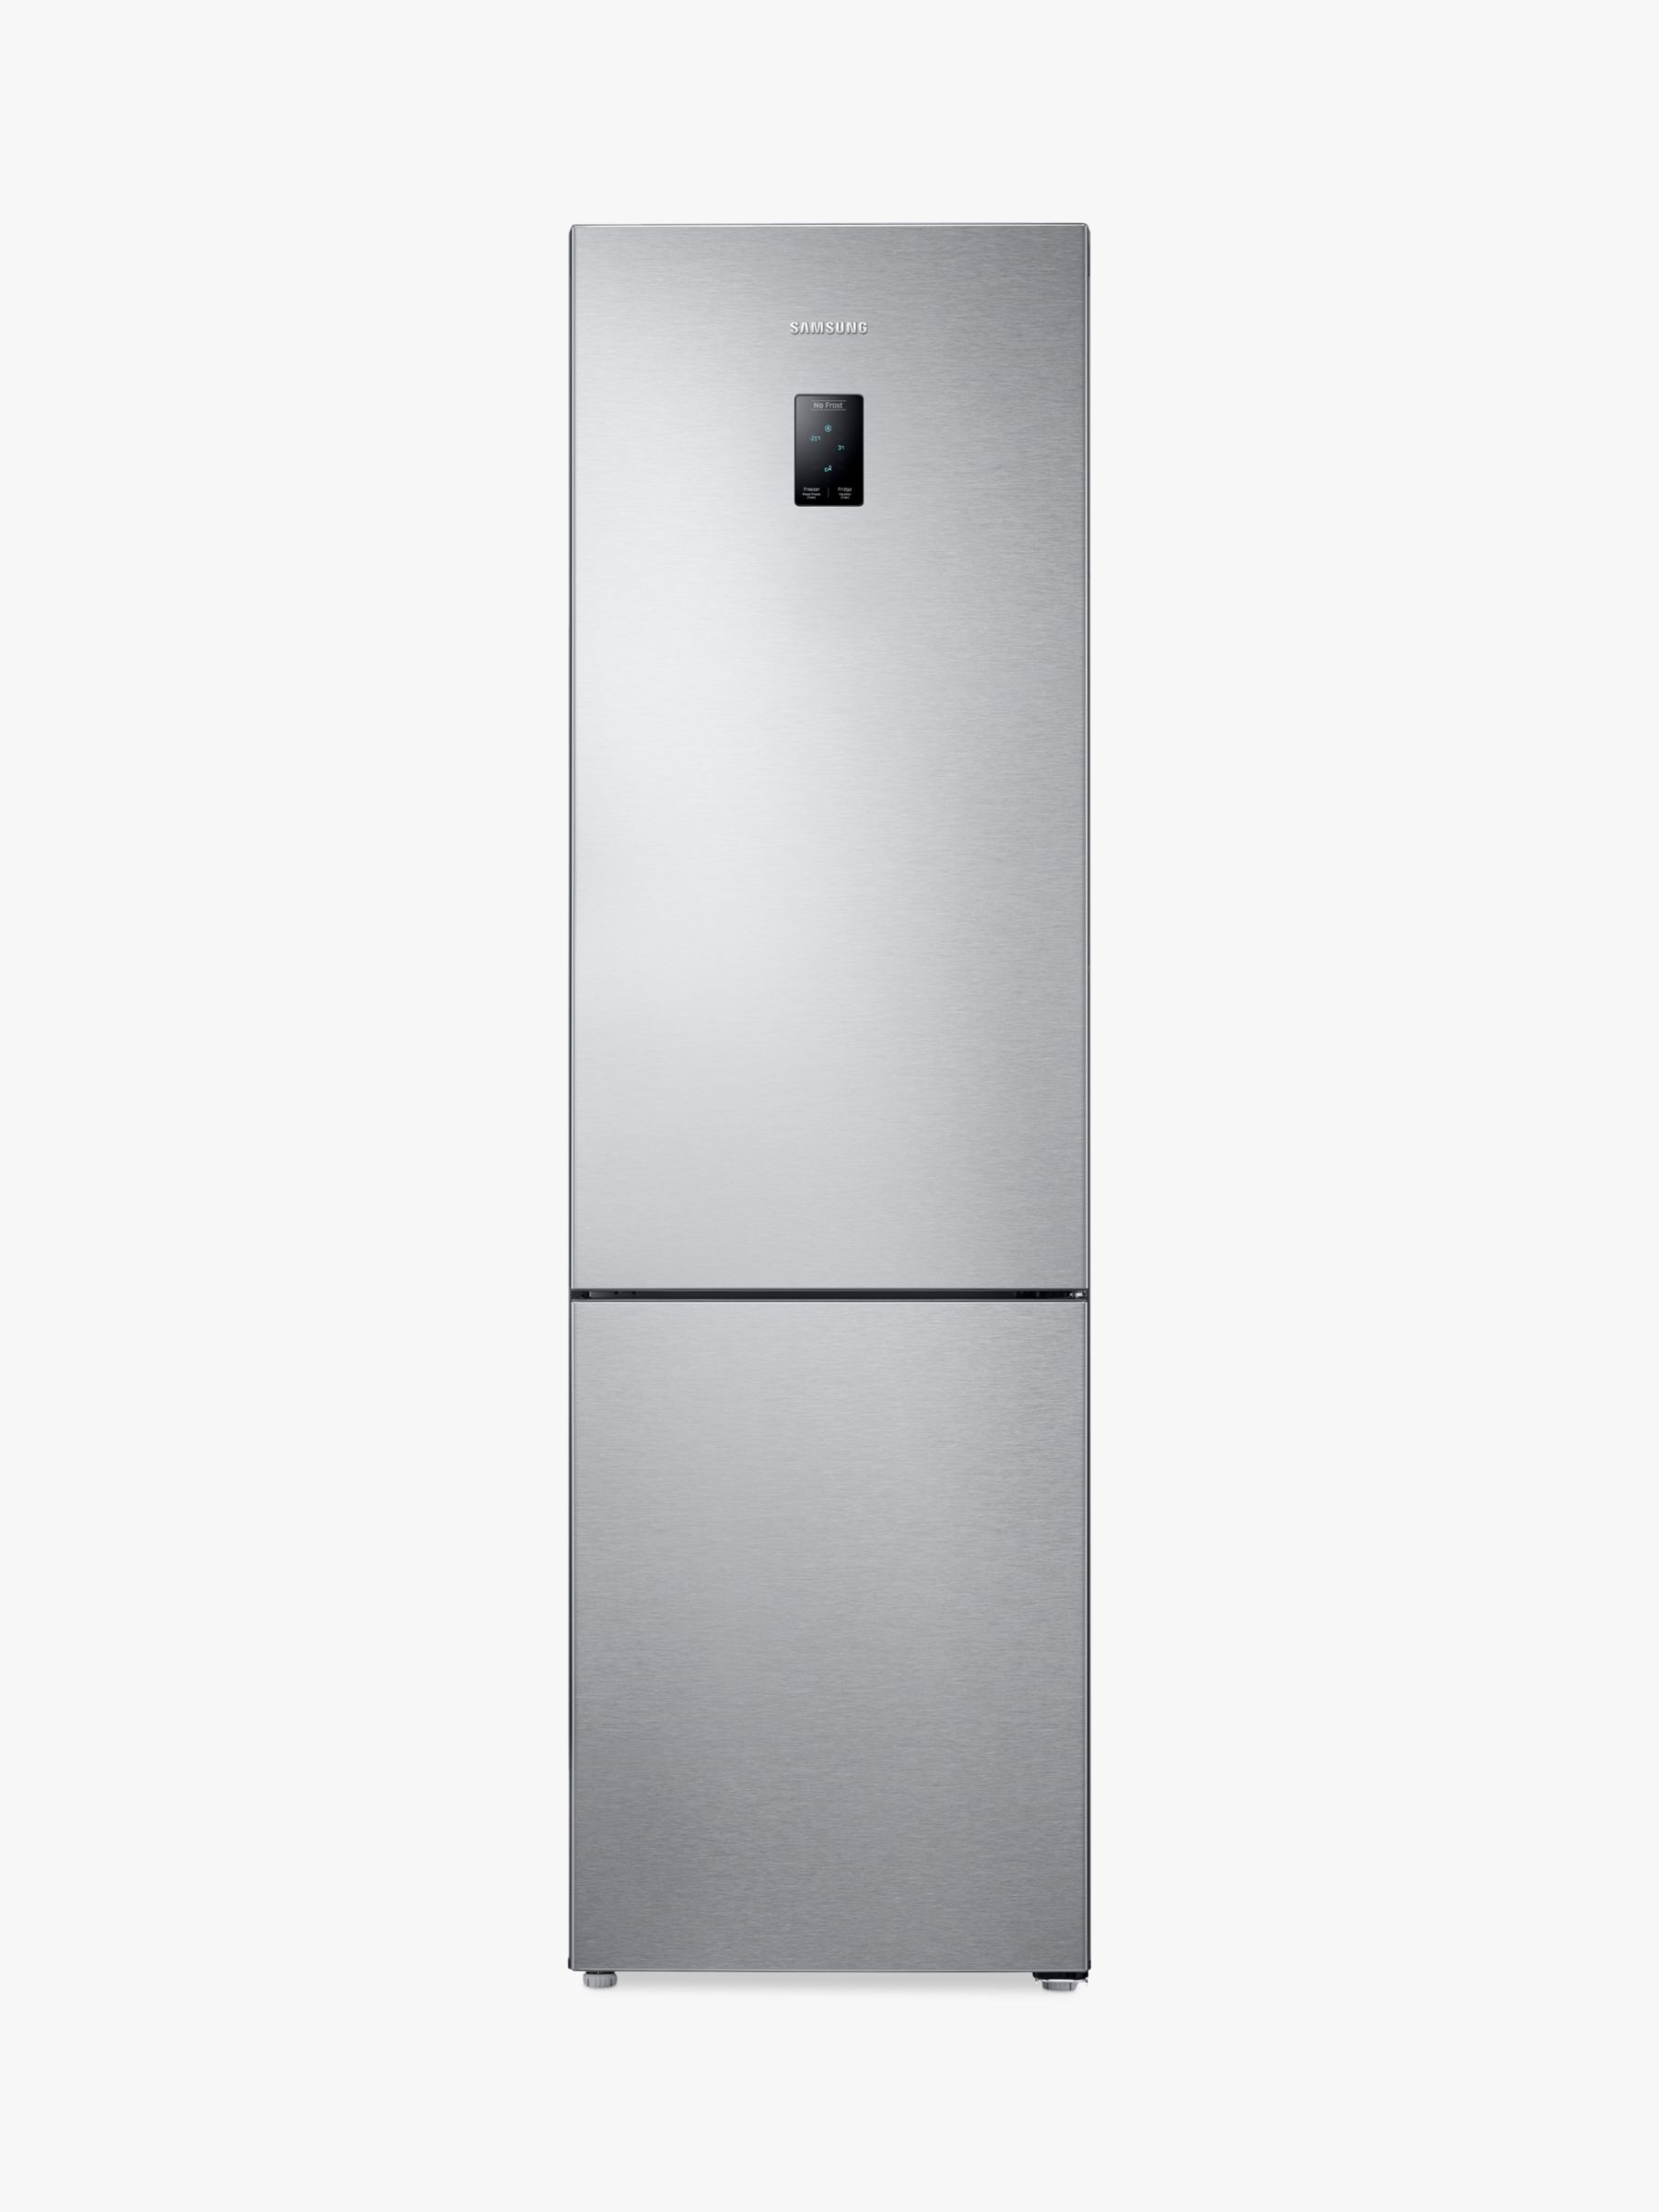 Samsung Samsung RB37J5230SL Freestanding Fridge-Freezer, A+ Energy Rating, 60cm Wide, Stainless Steel